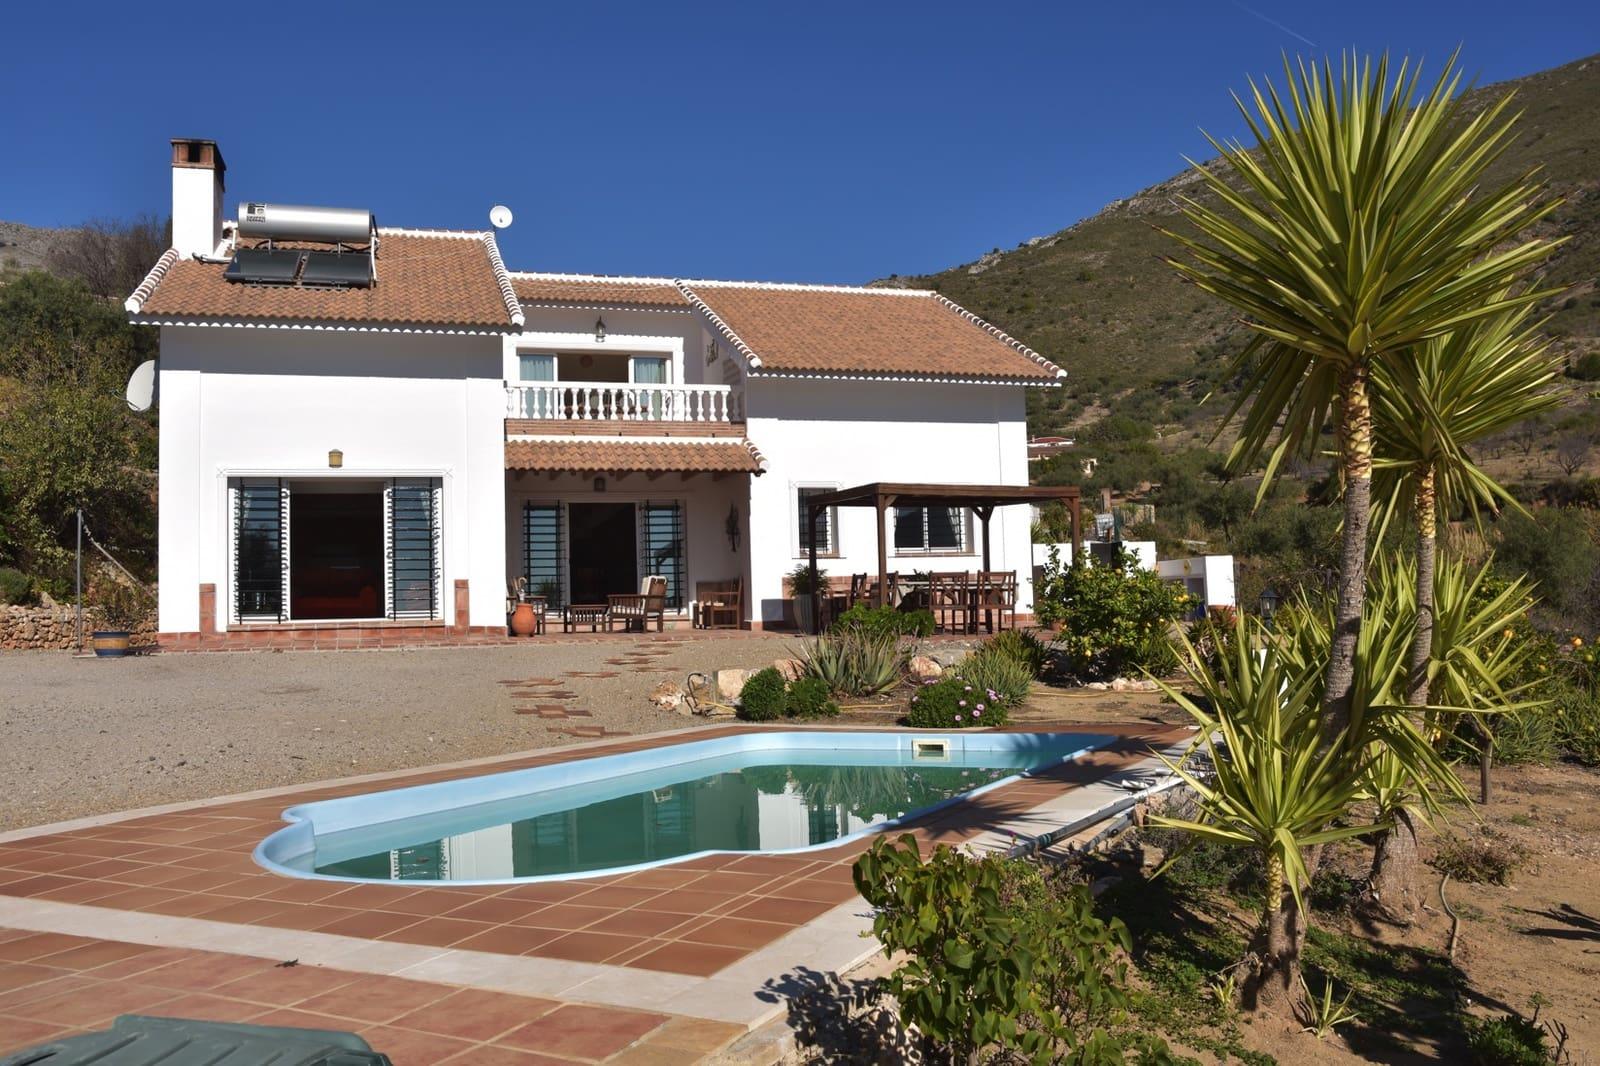 4 bedroom Villa for sale in Alcaucin with pool - € 390,000 (Ref: 4977671)